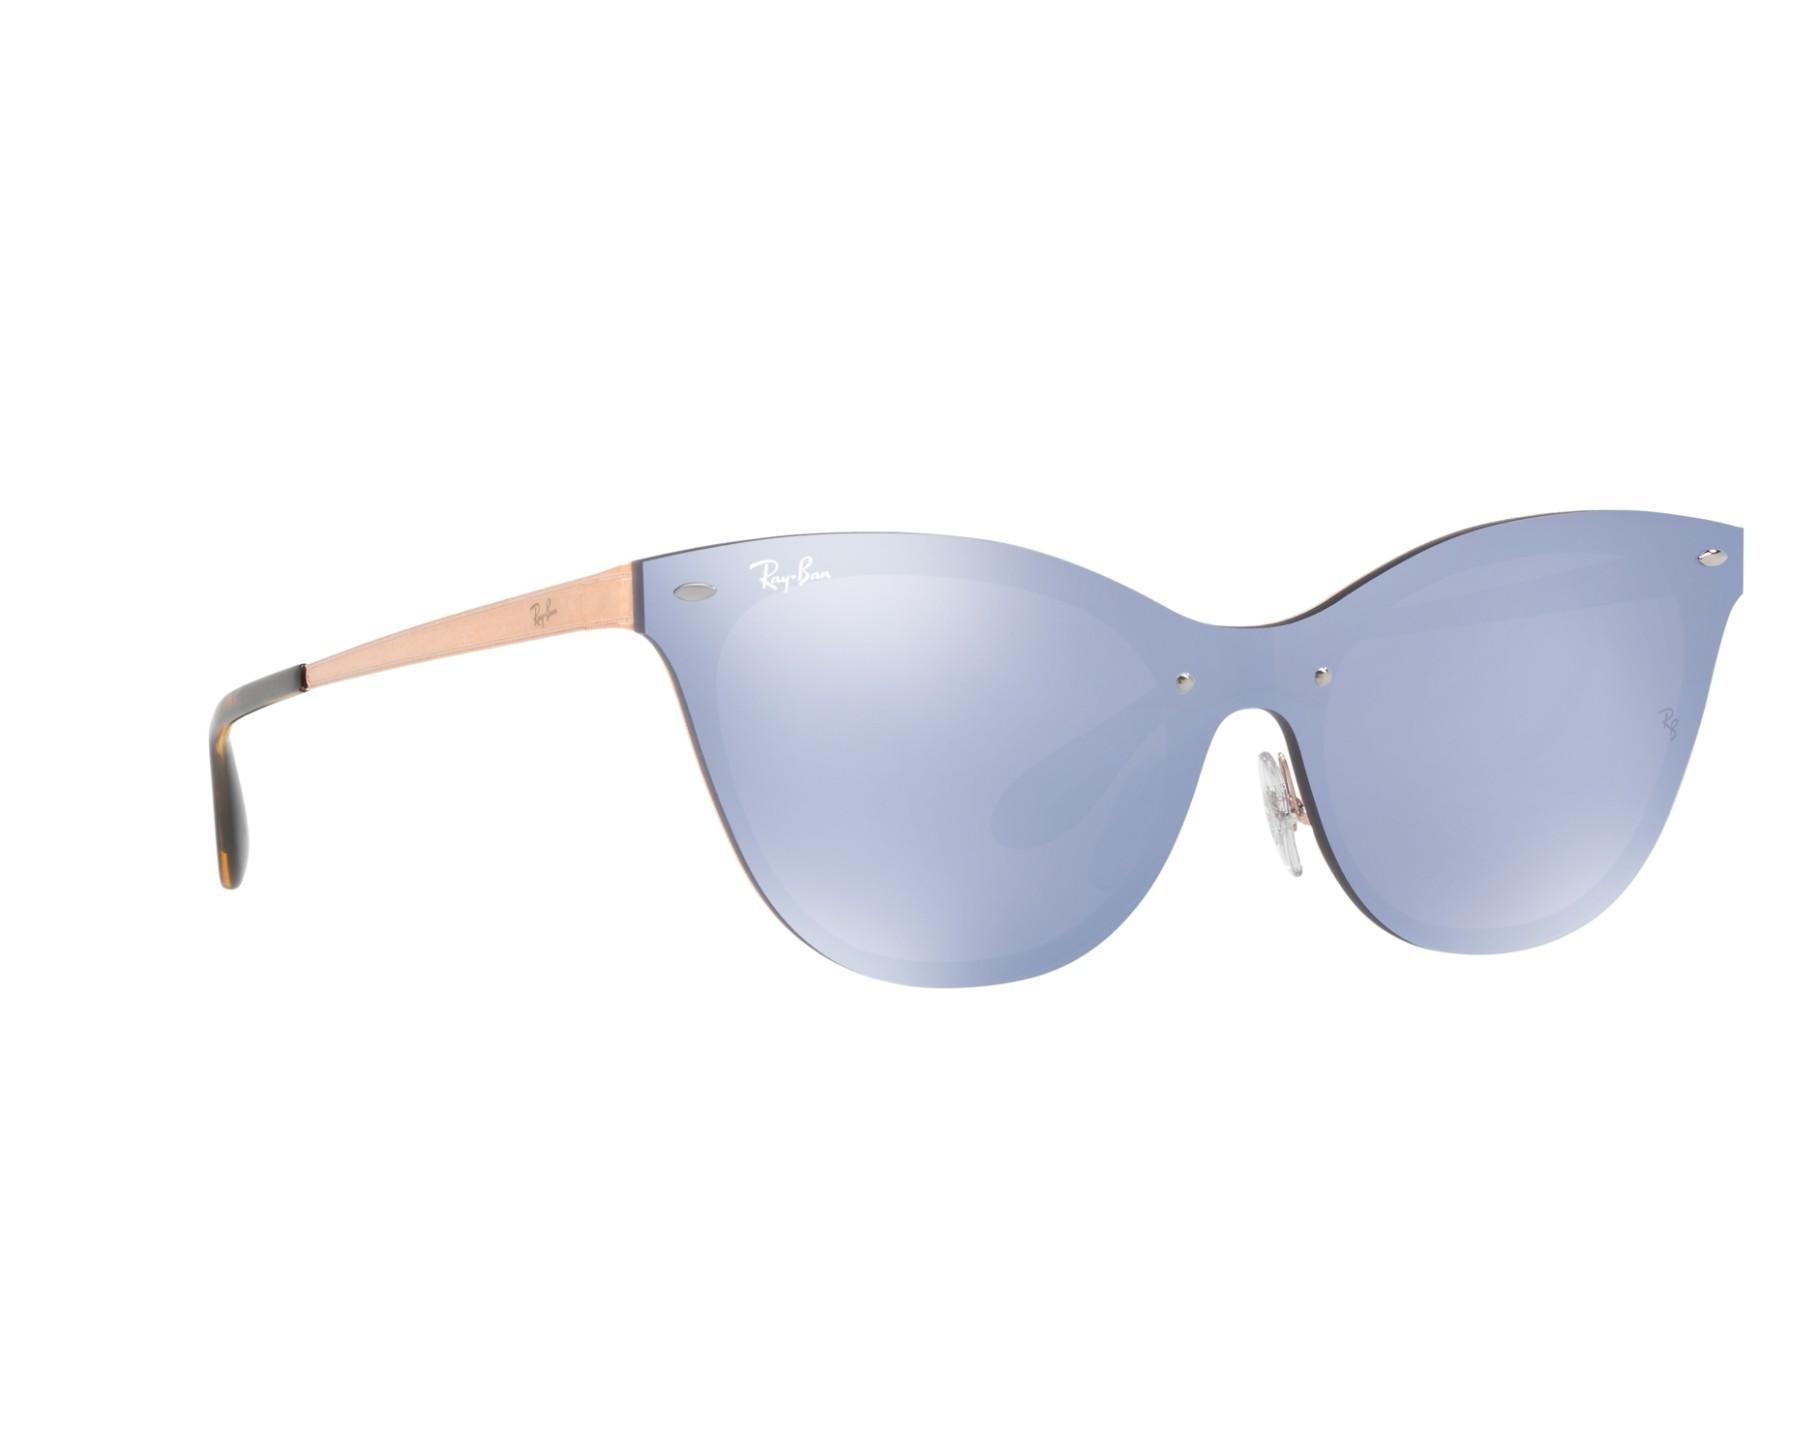 745b77716c Gafas de sol Ray-Ban RB-3580-N 90391U 43- Latón Vista